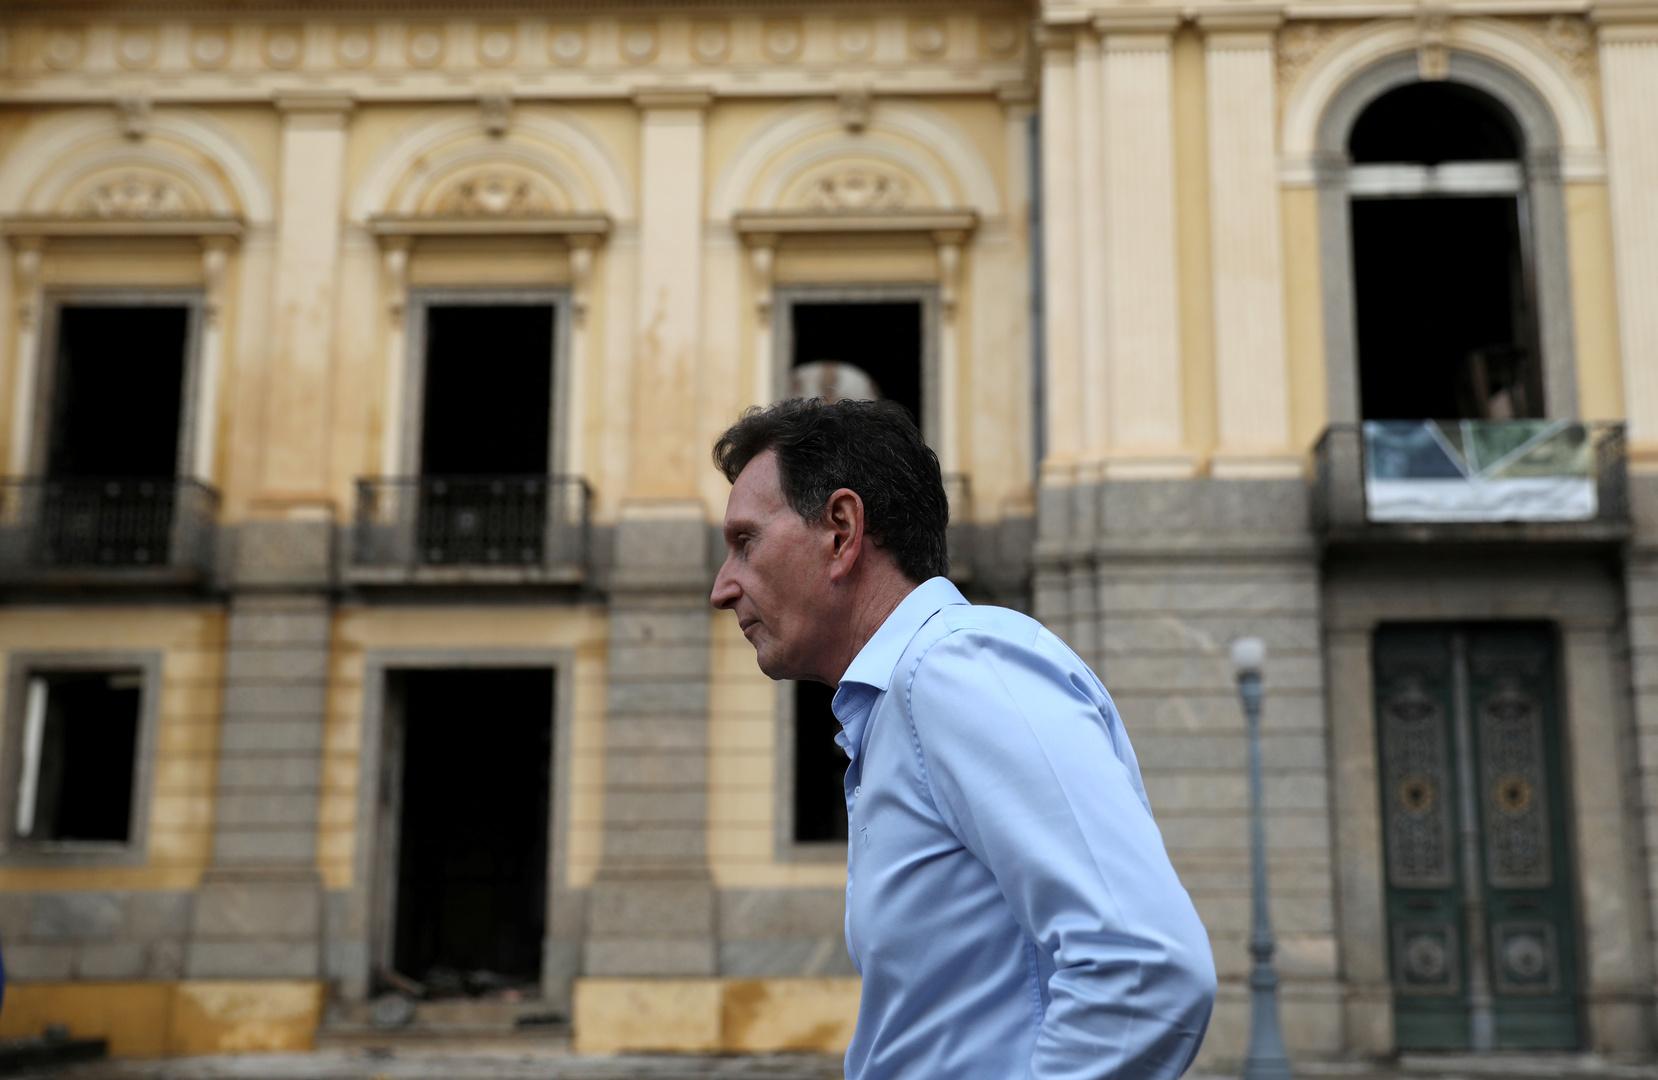 اعتقال عمدة ريو دي جانيرو بتهم فساد ورشى